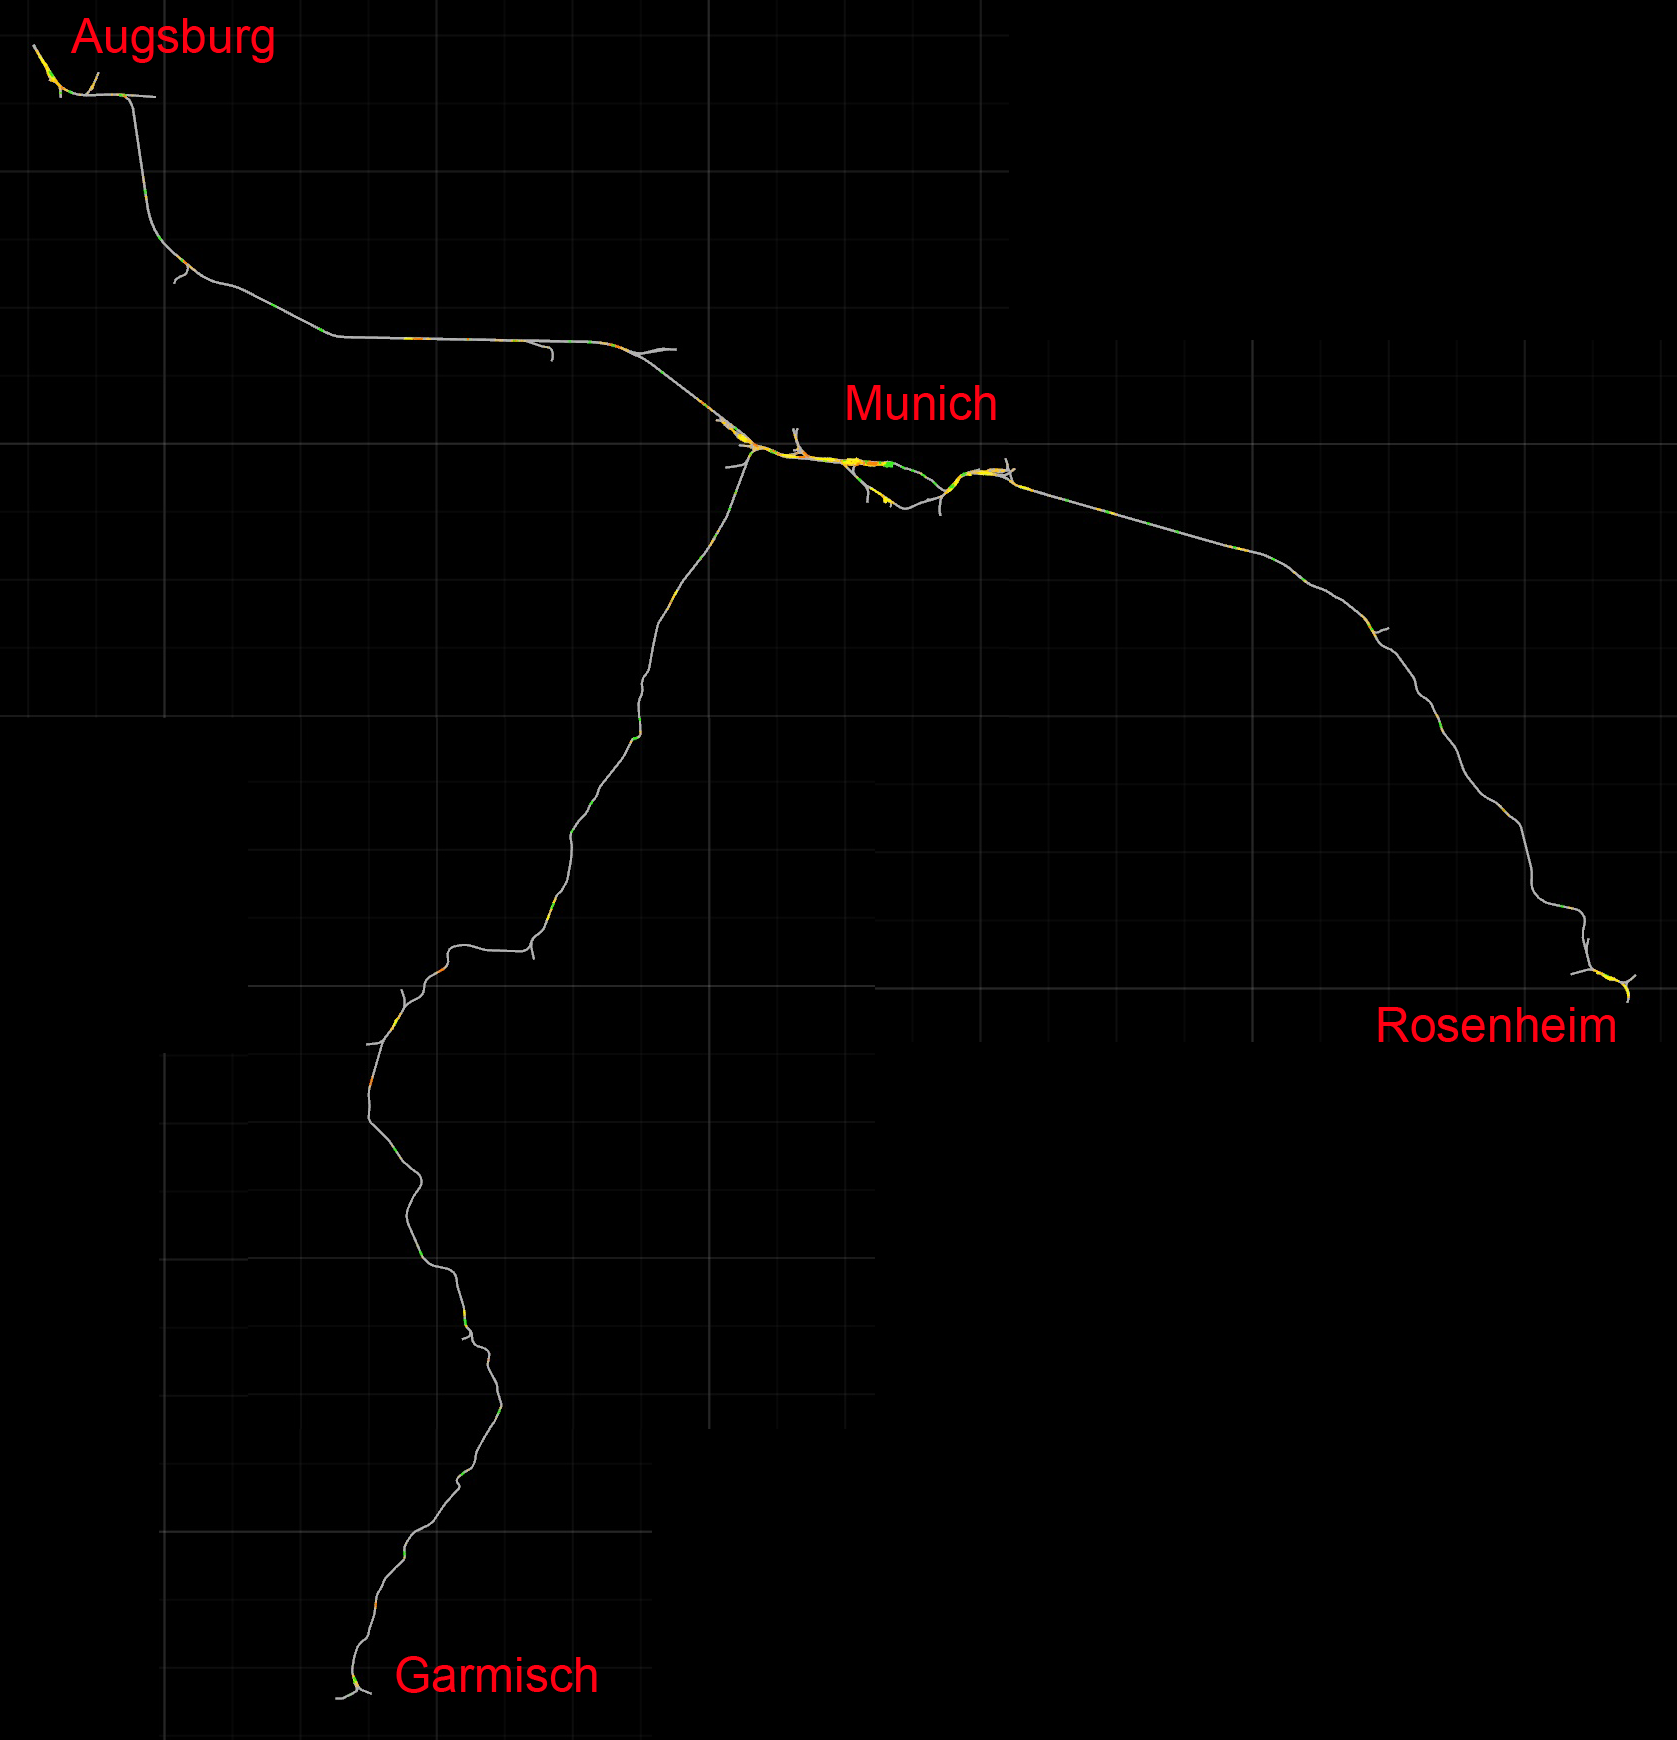 munich to augsburg rail simulator crack